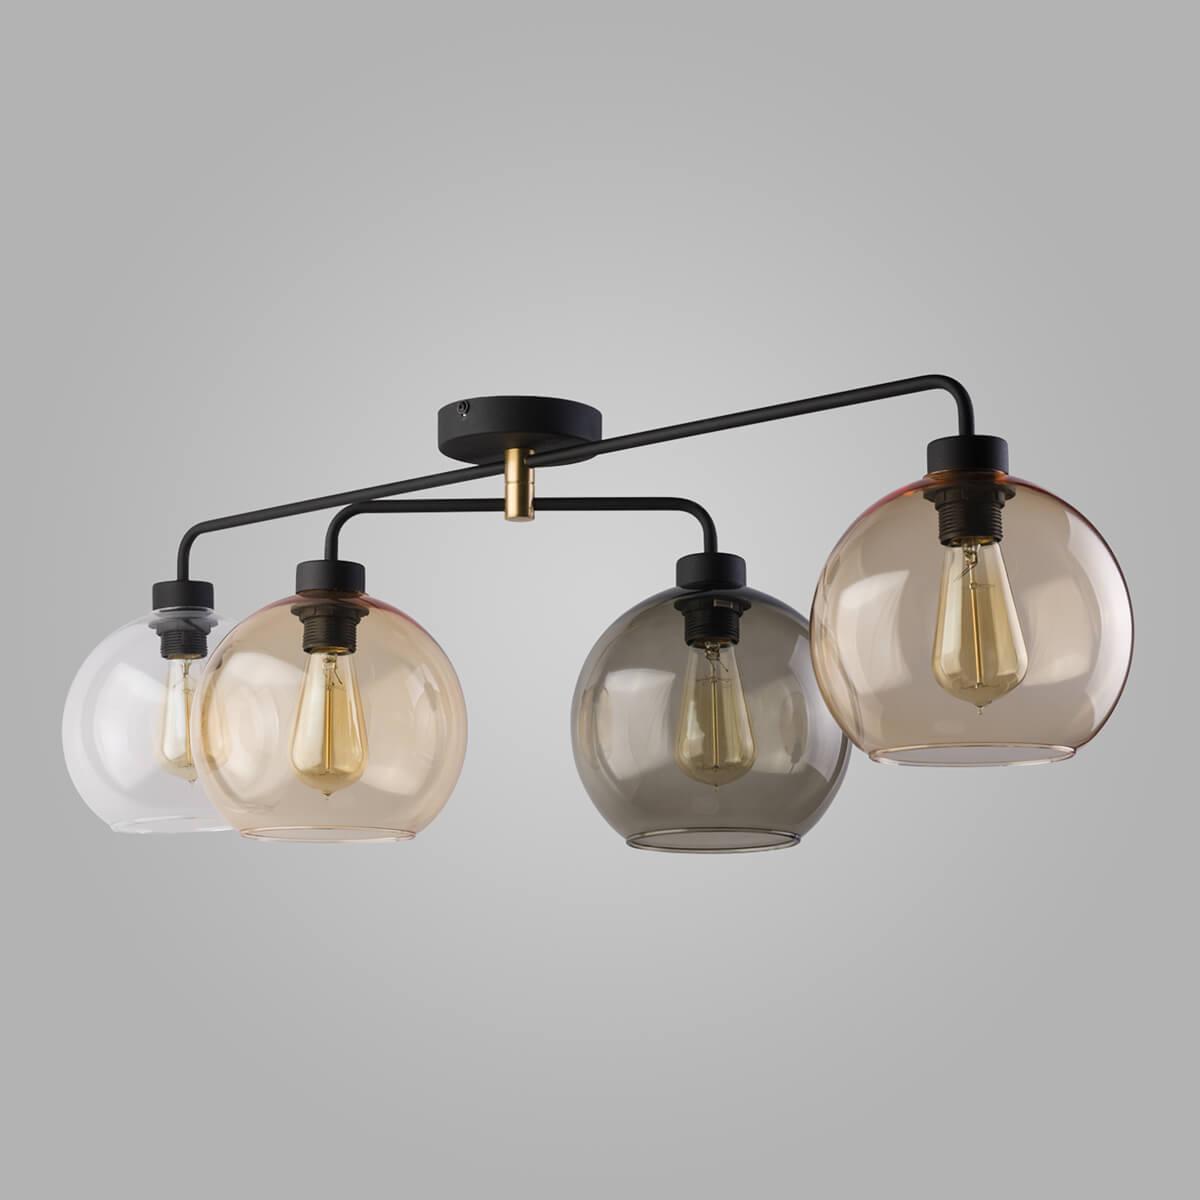 Люстра TK Lighting 4460 Grant Grant